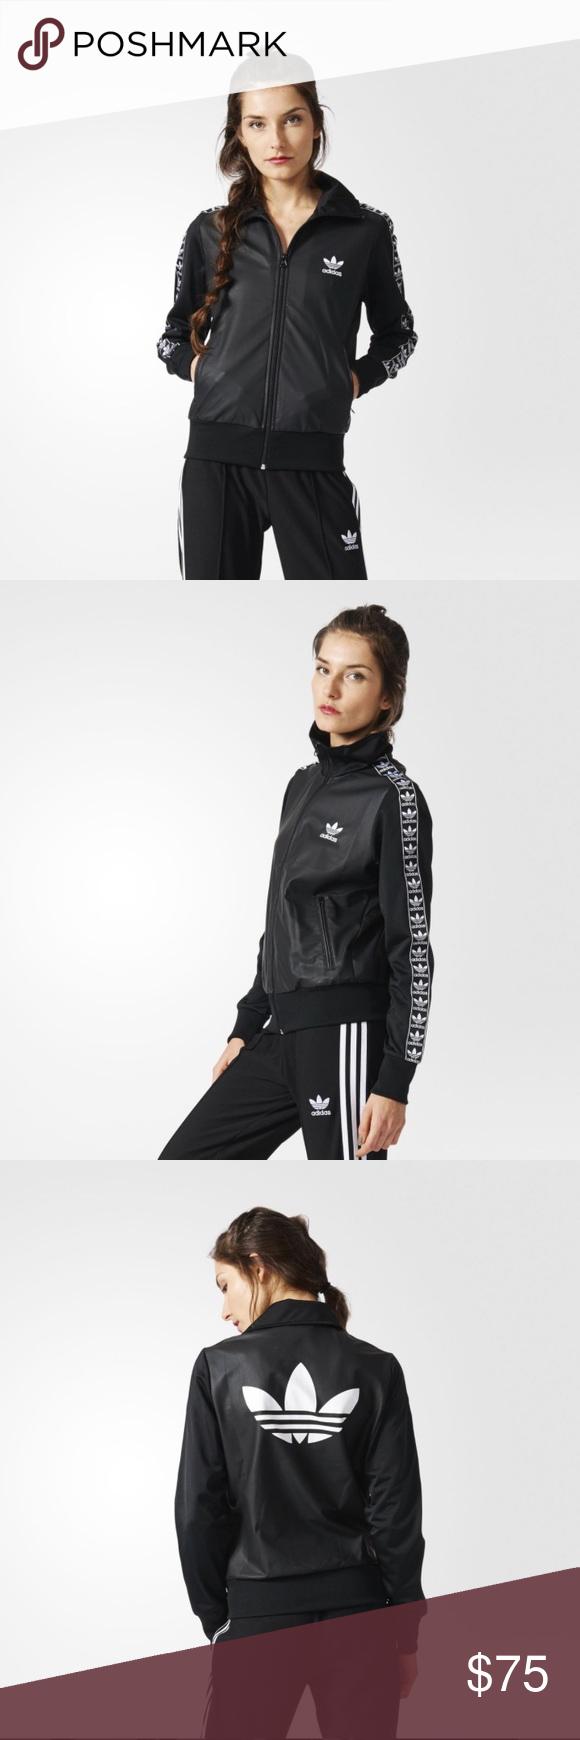 ¡Adidas firebird Track Jacket Brand New!Nunca ha sido el tamaño es l